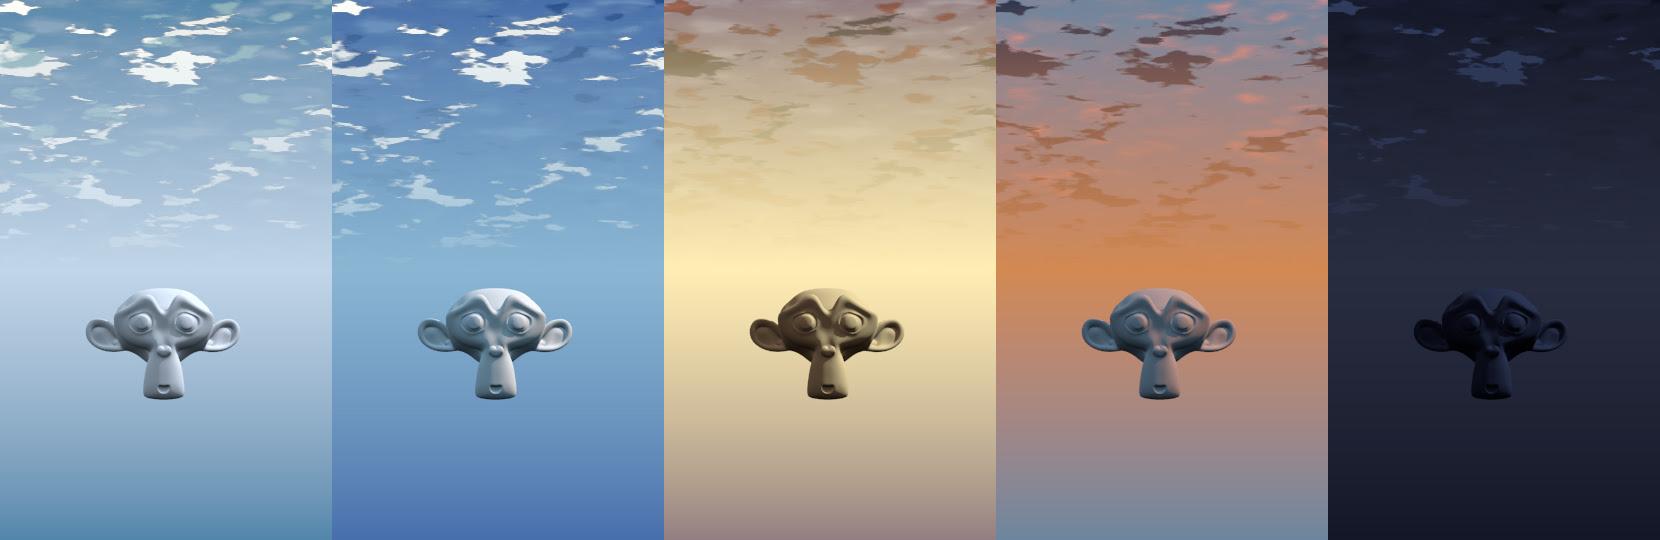 blender procedural cloud